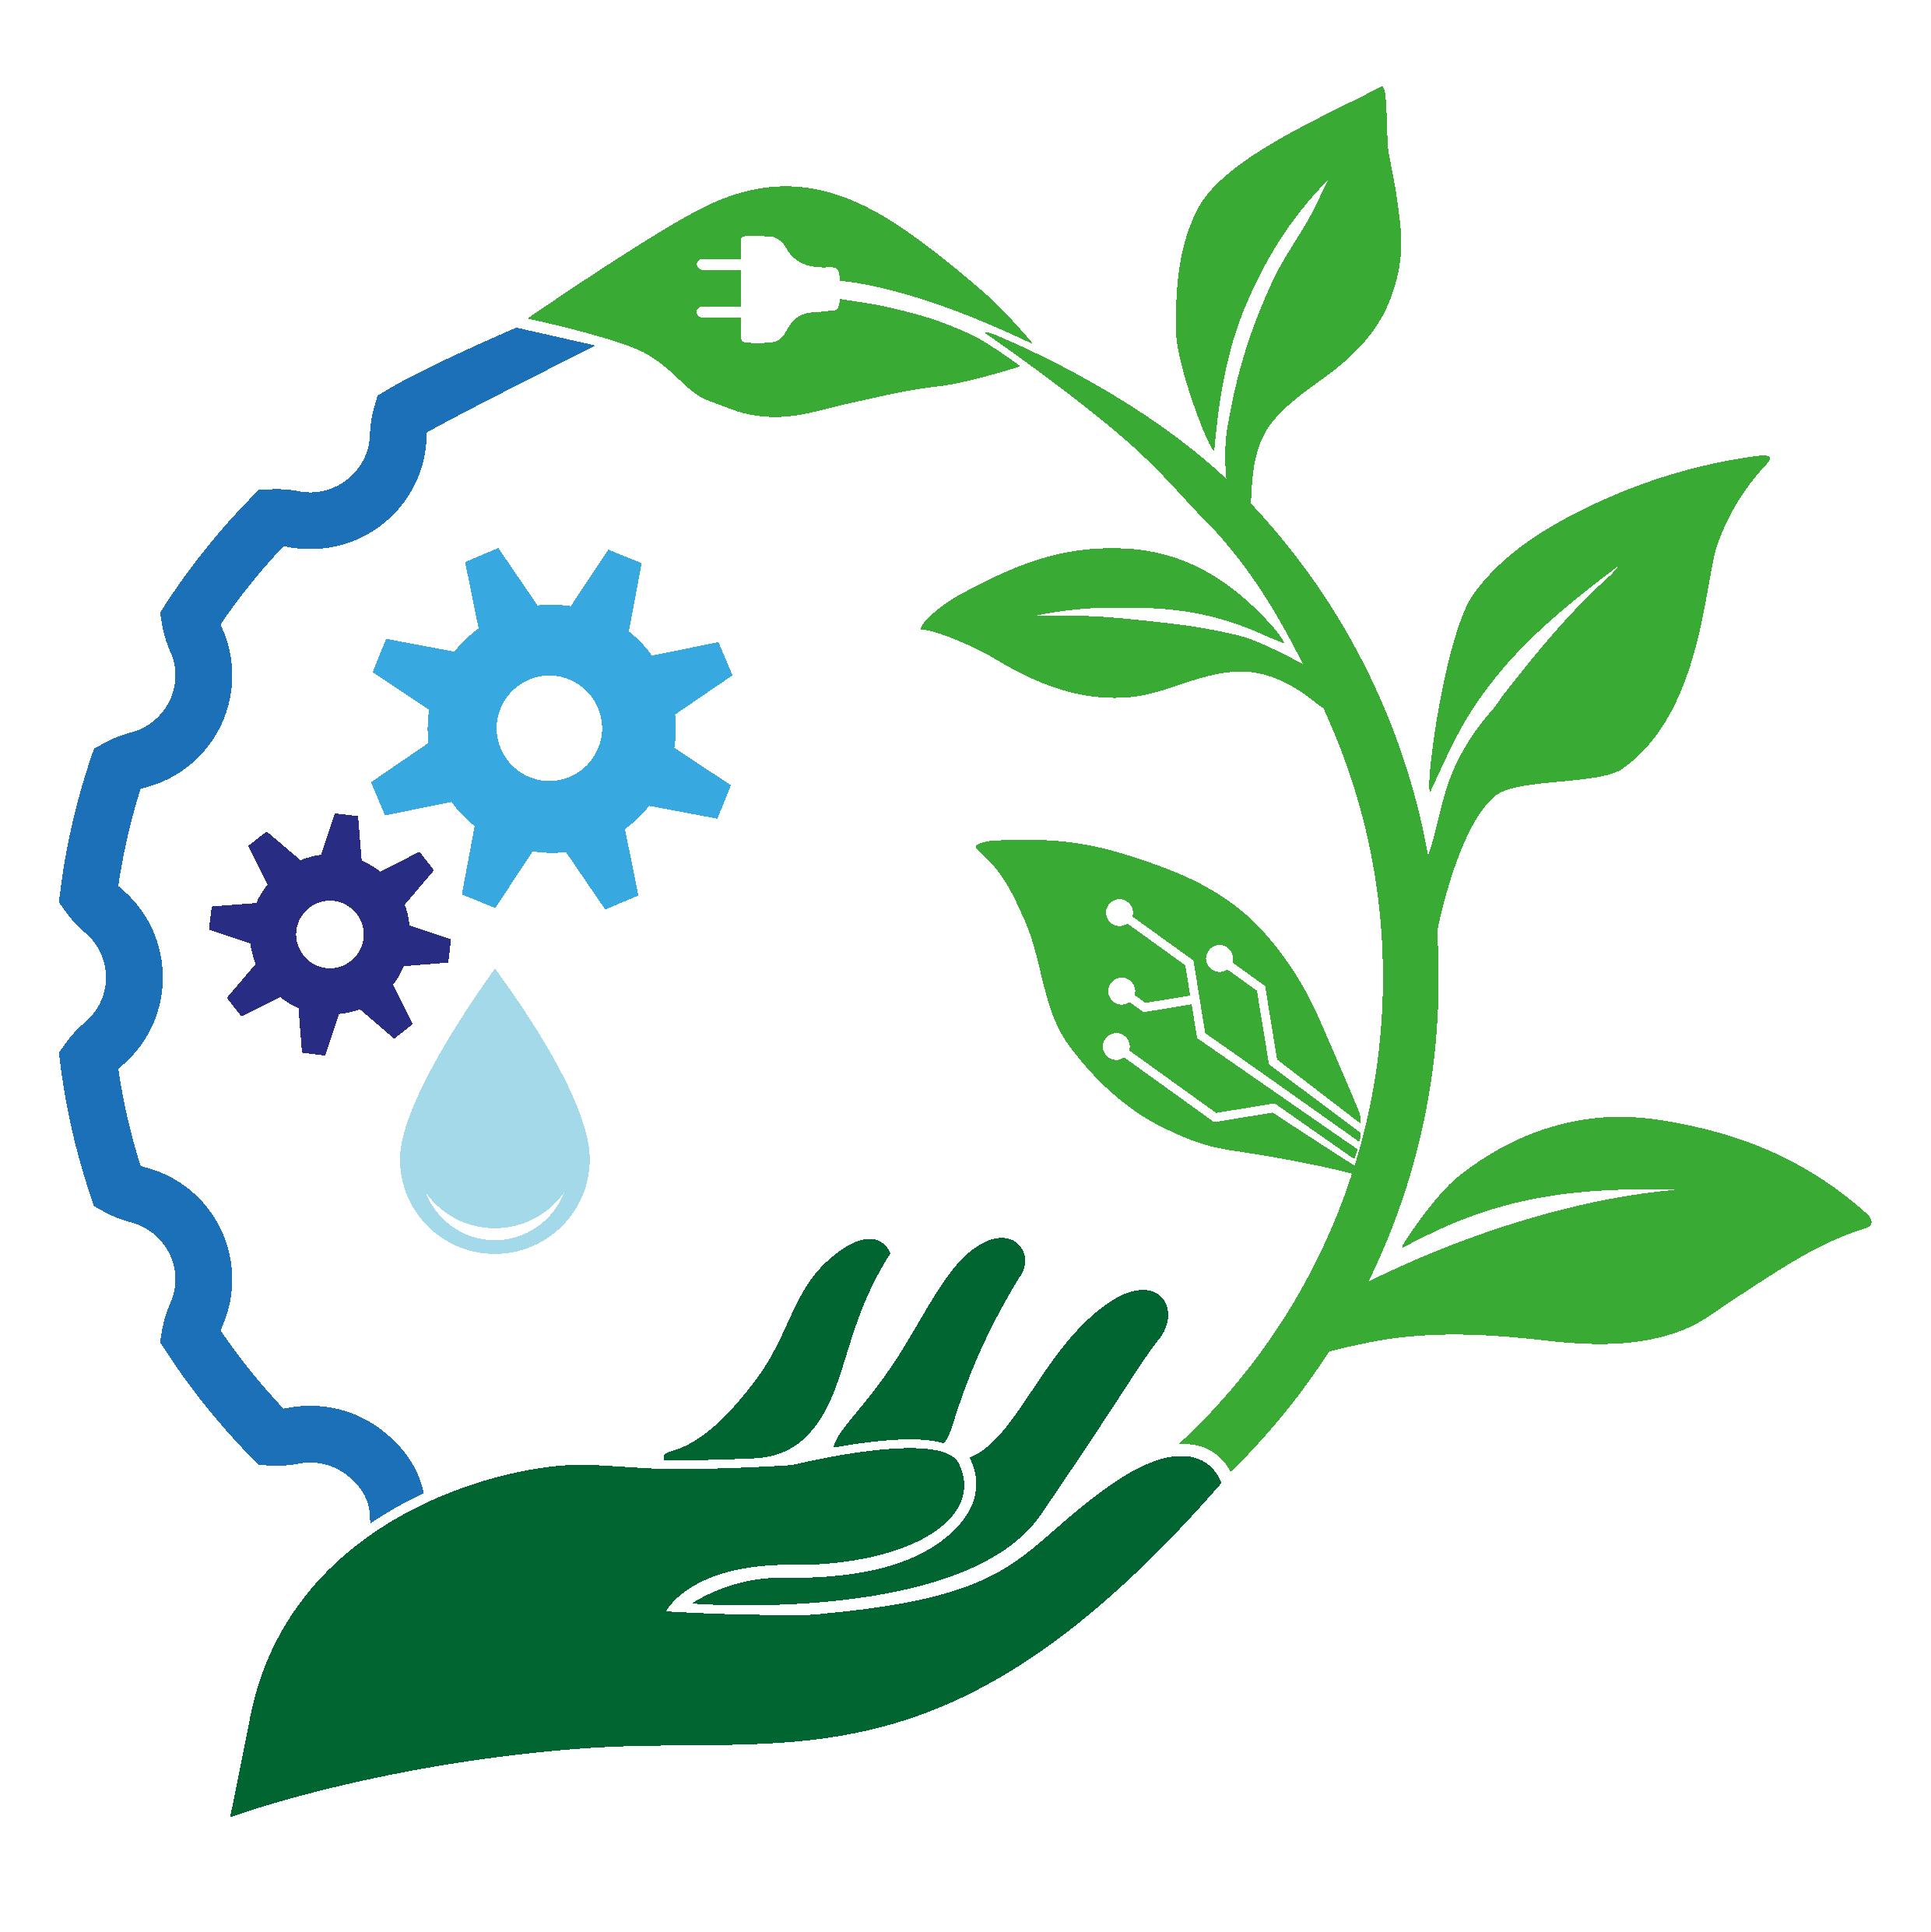 Auerbach Gartenbautechnik